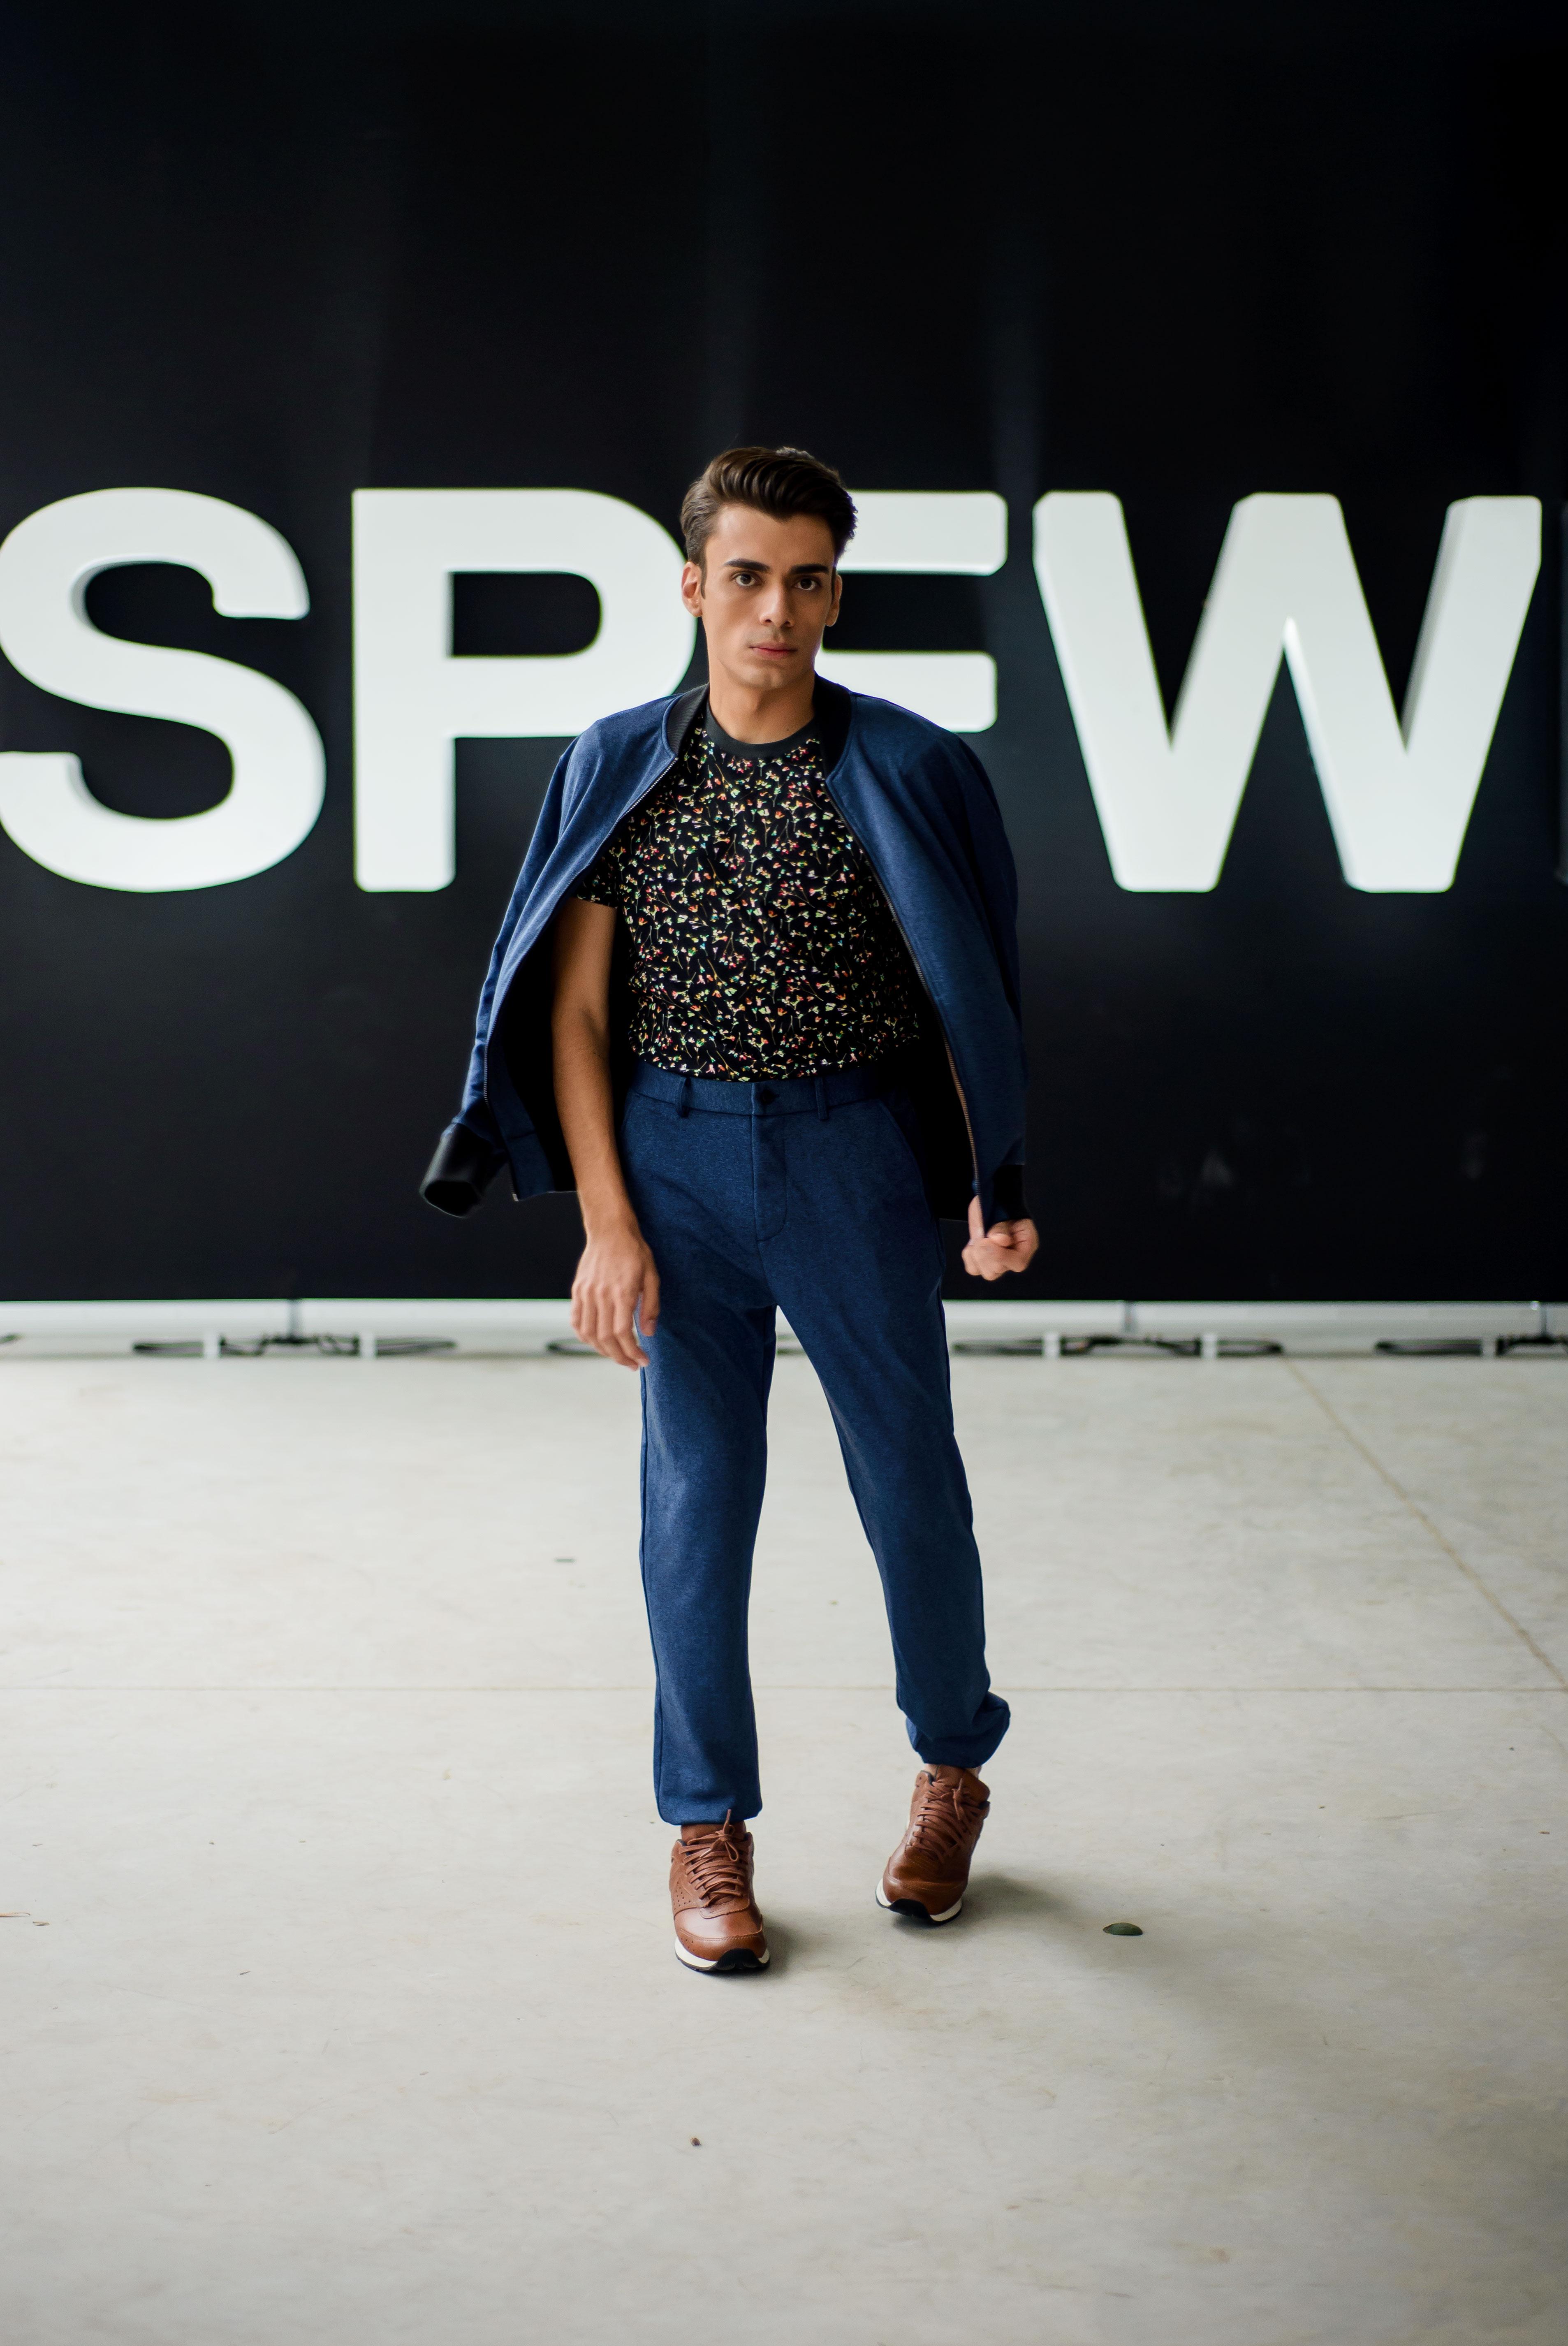 alex cursino, camila coelho, moda sem censura, qg fhits, spfw, alice ferraz, estilo, moda, blogueiro de moda, youtuber, canal de moda, (11)